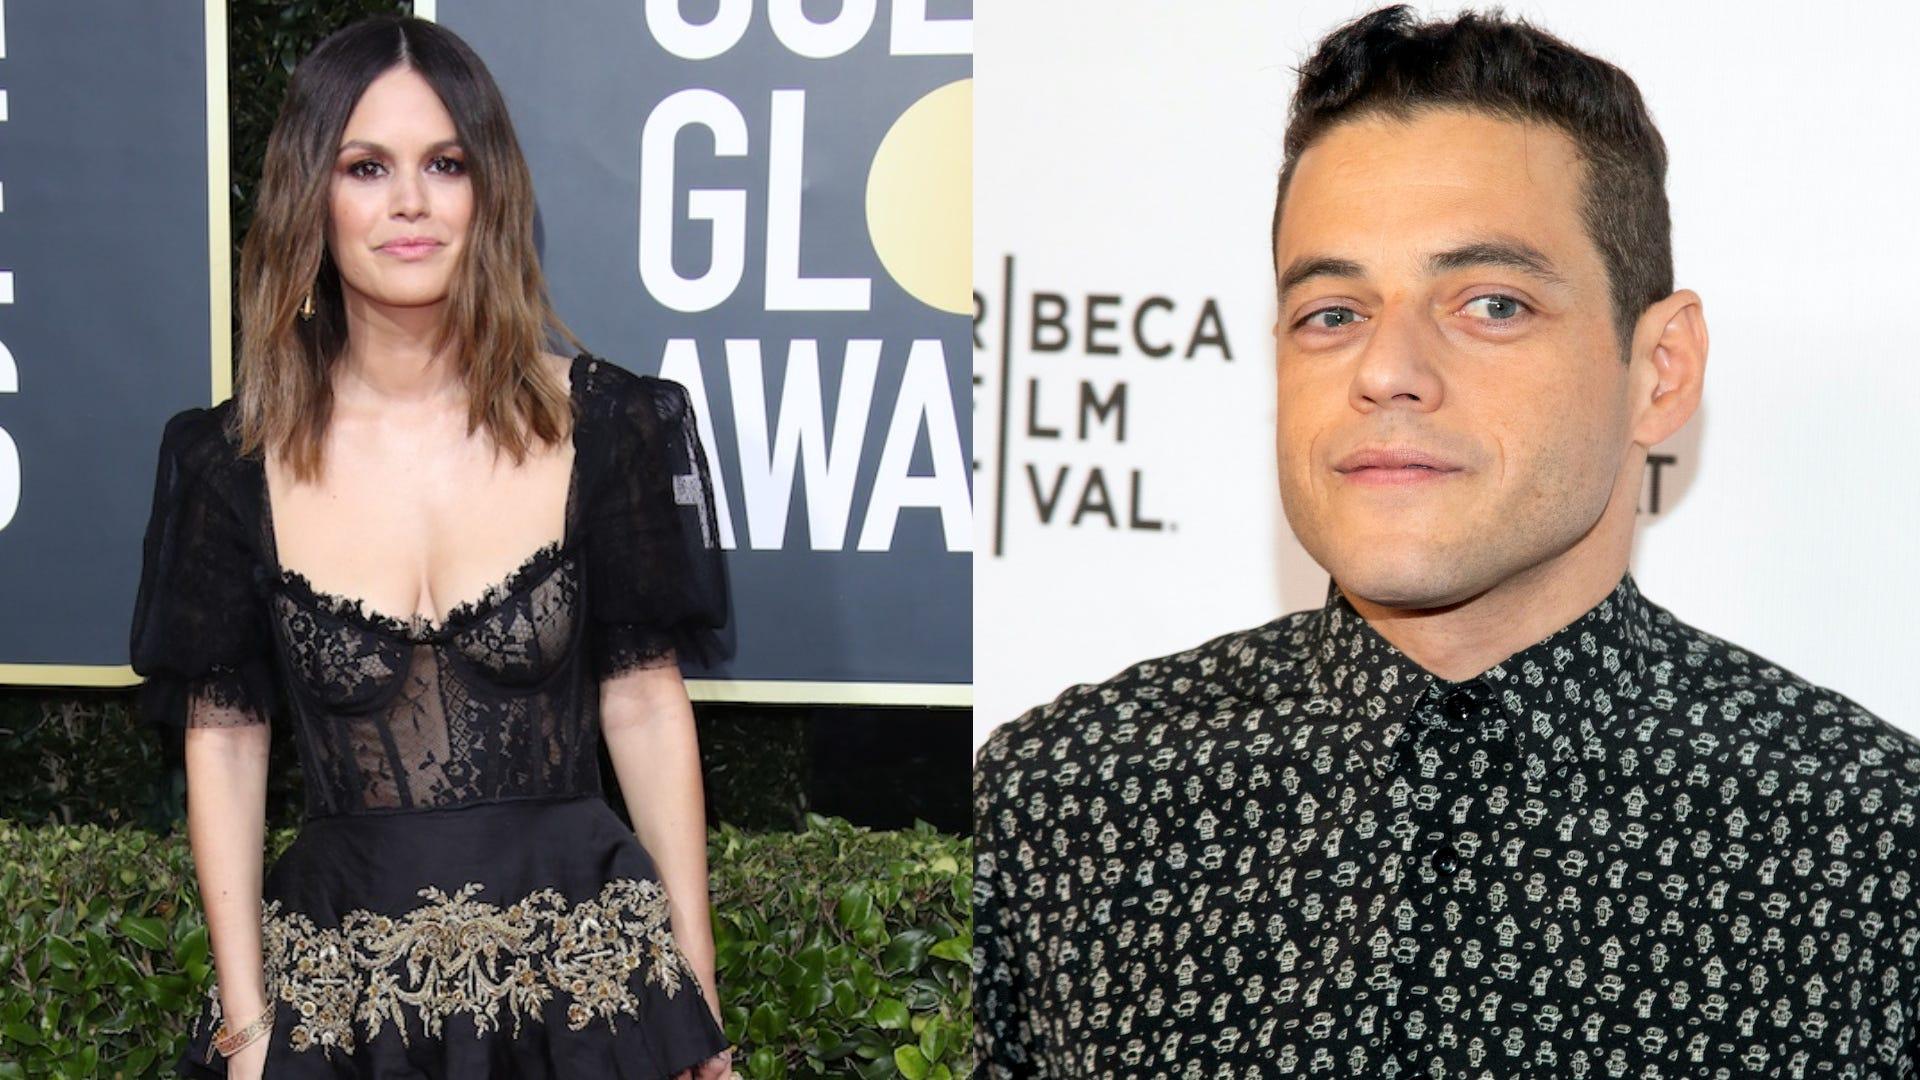 Rachel Bilson reveals why Rami Malek asked her to delete their high school Instagram photo